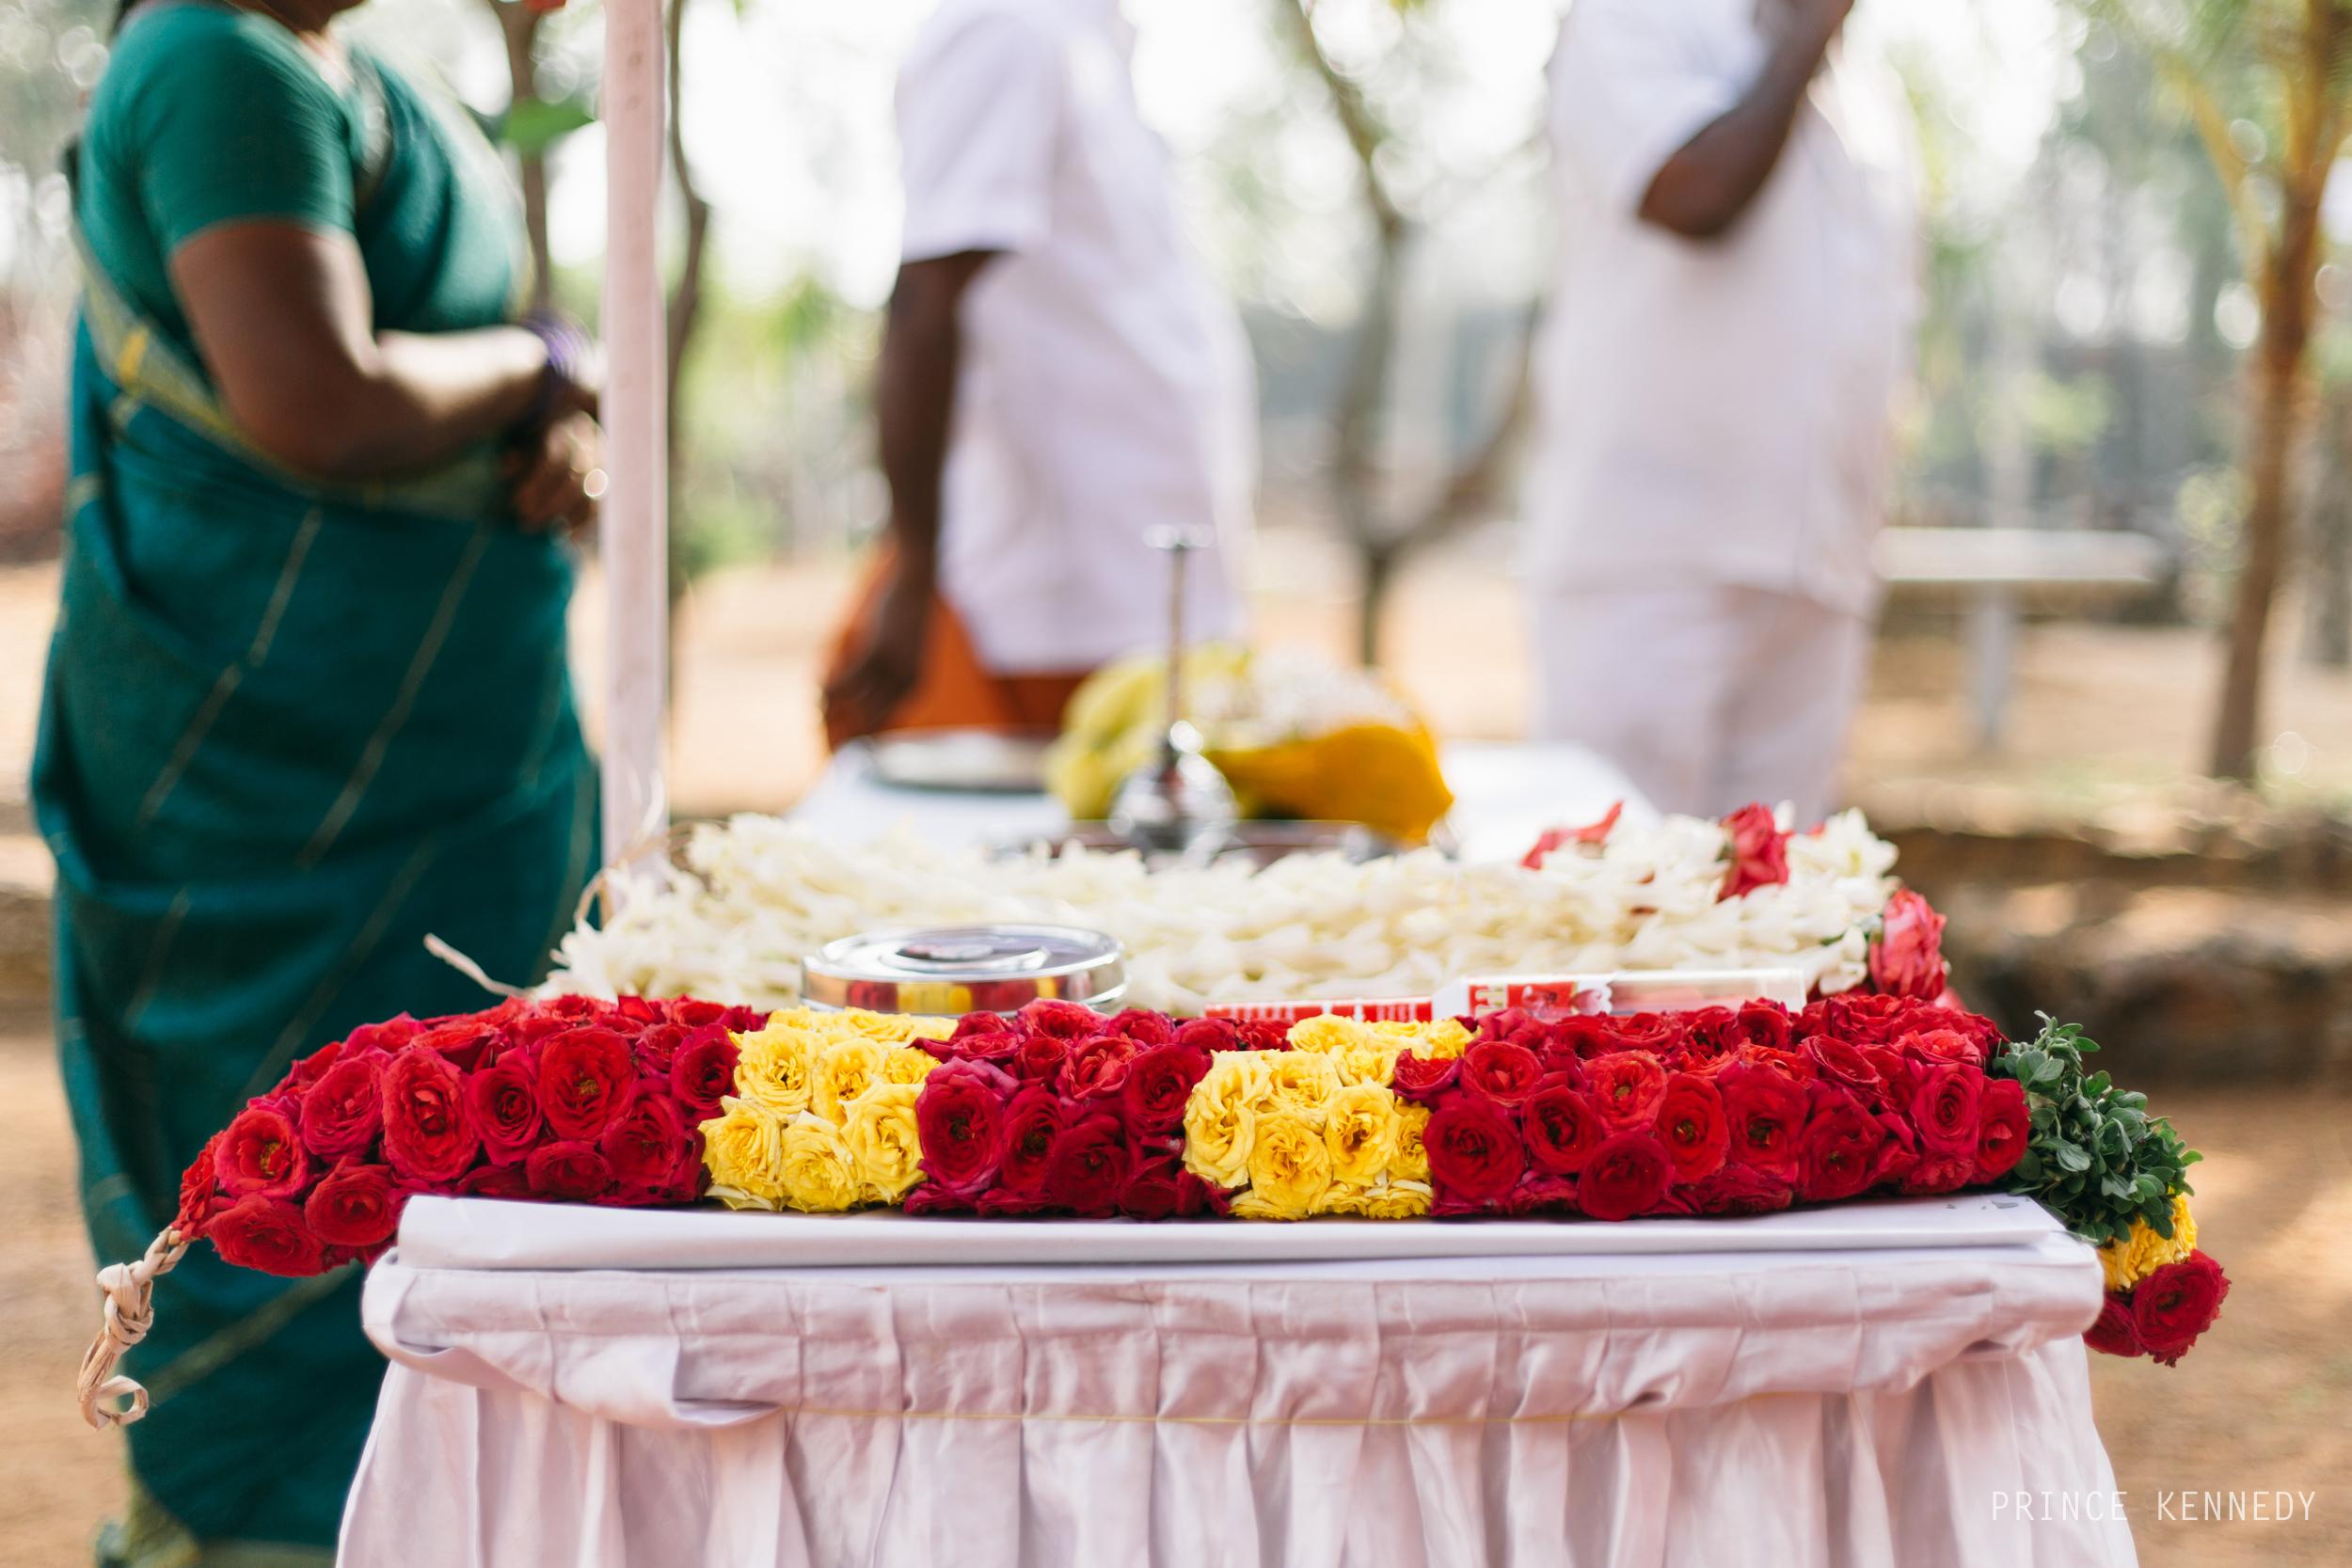 Athmajja-Nithesh-Engagement-Couple-Portrait-Portraiture-Wedding-Couple-Portrait-Chennai-Photographer-Candid-Photography-Destination-Best-Prince-Kennedy-Photography-56.jpg